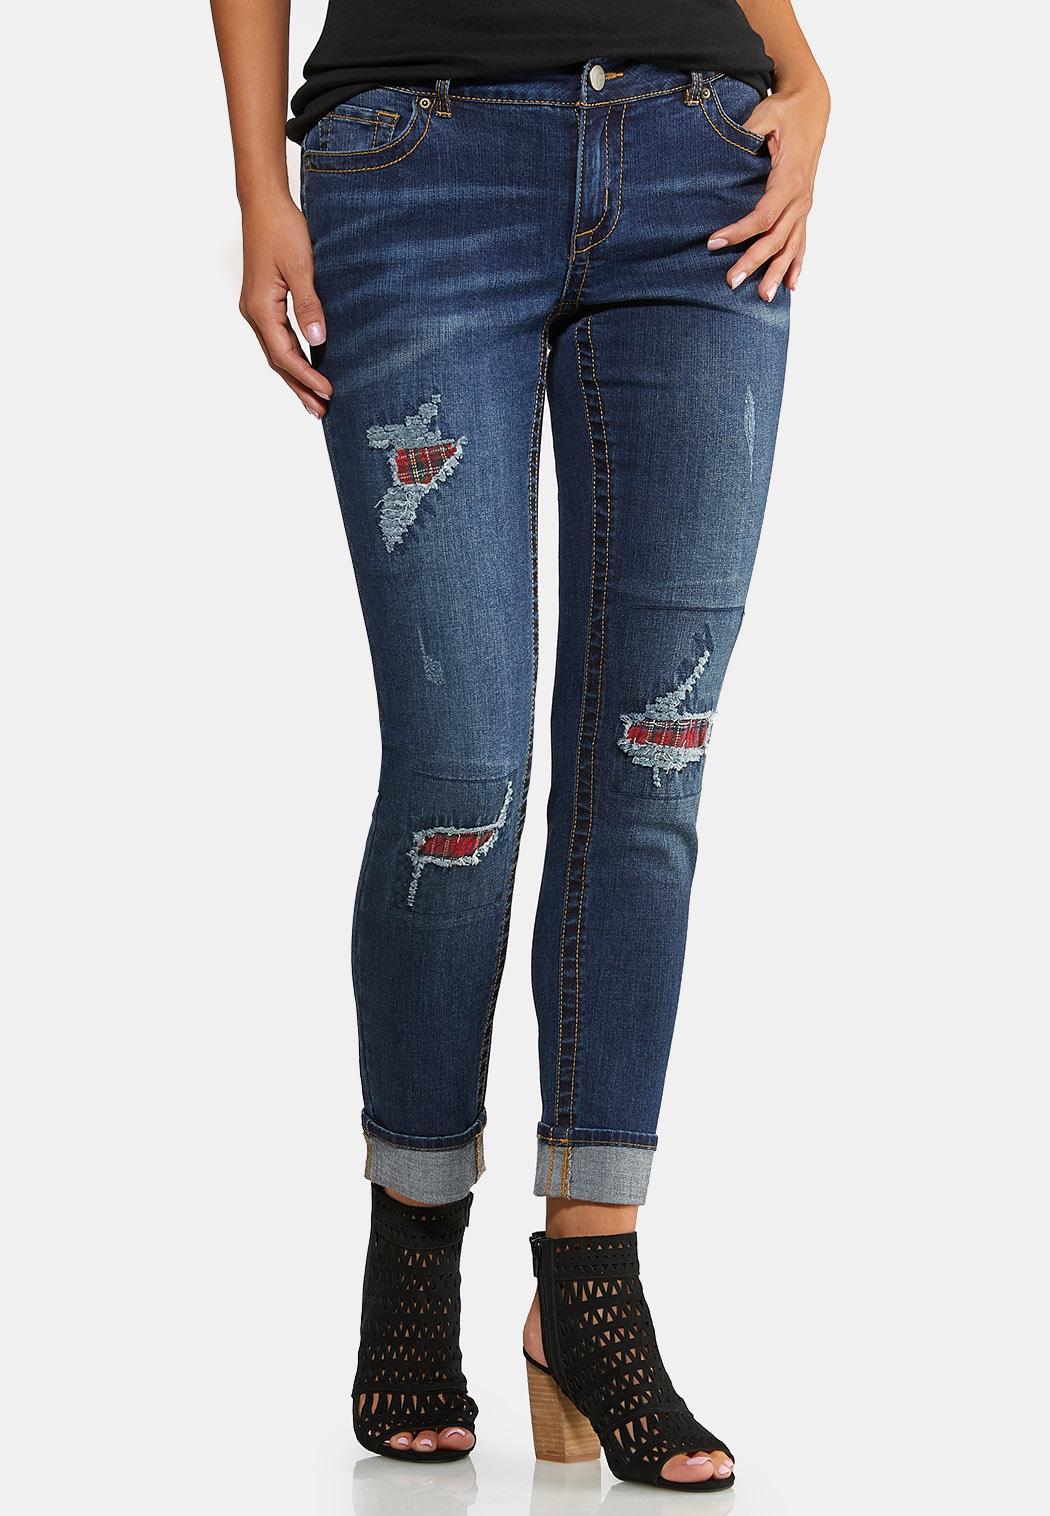 Plaid Patch Girlfriend Jeans